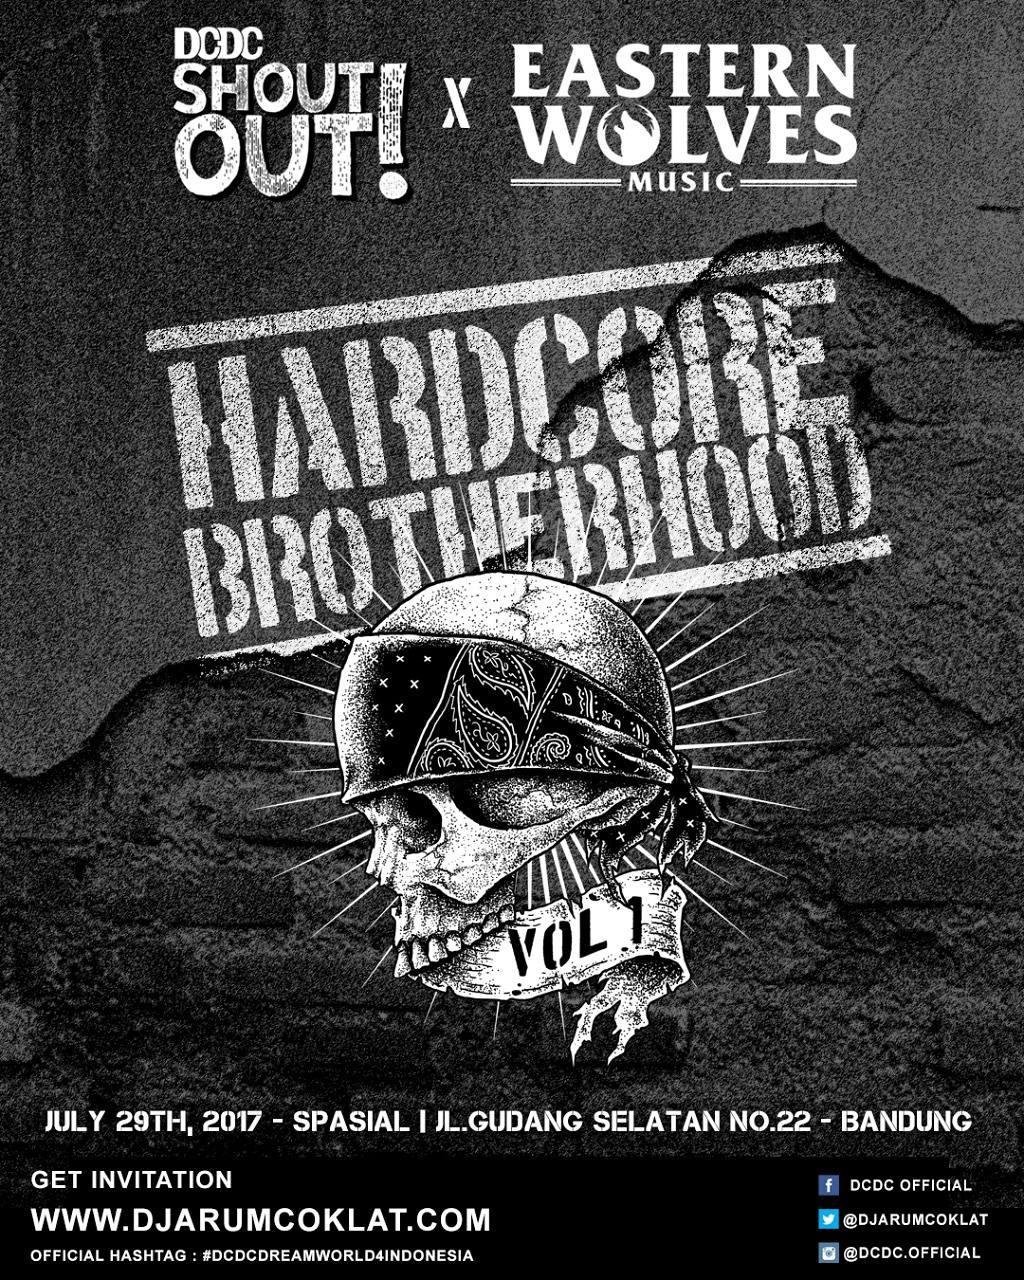 Hardcore Brotherhood Vol. 1